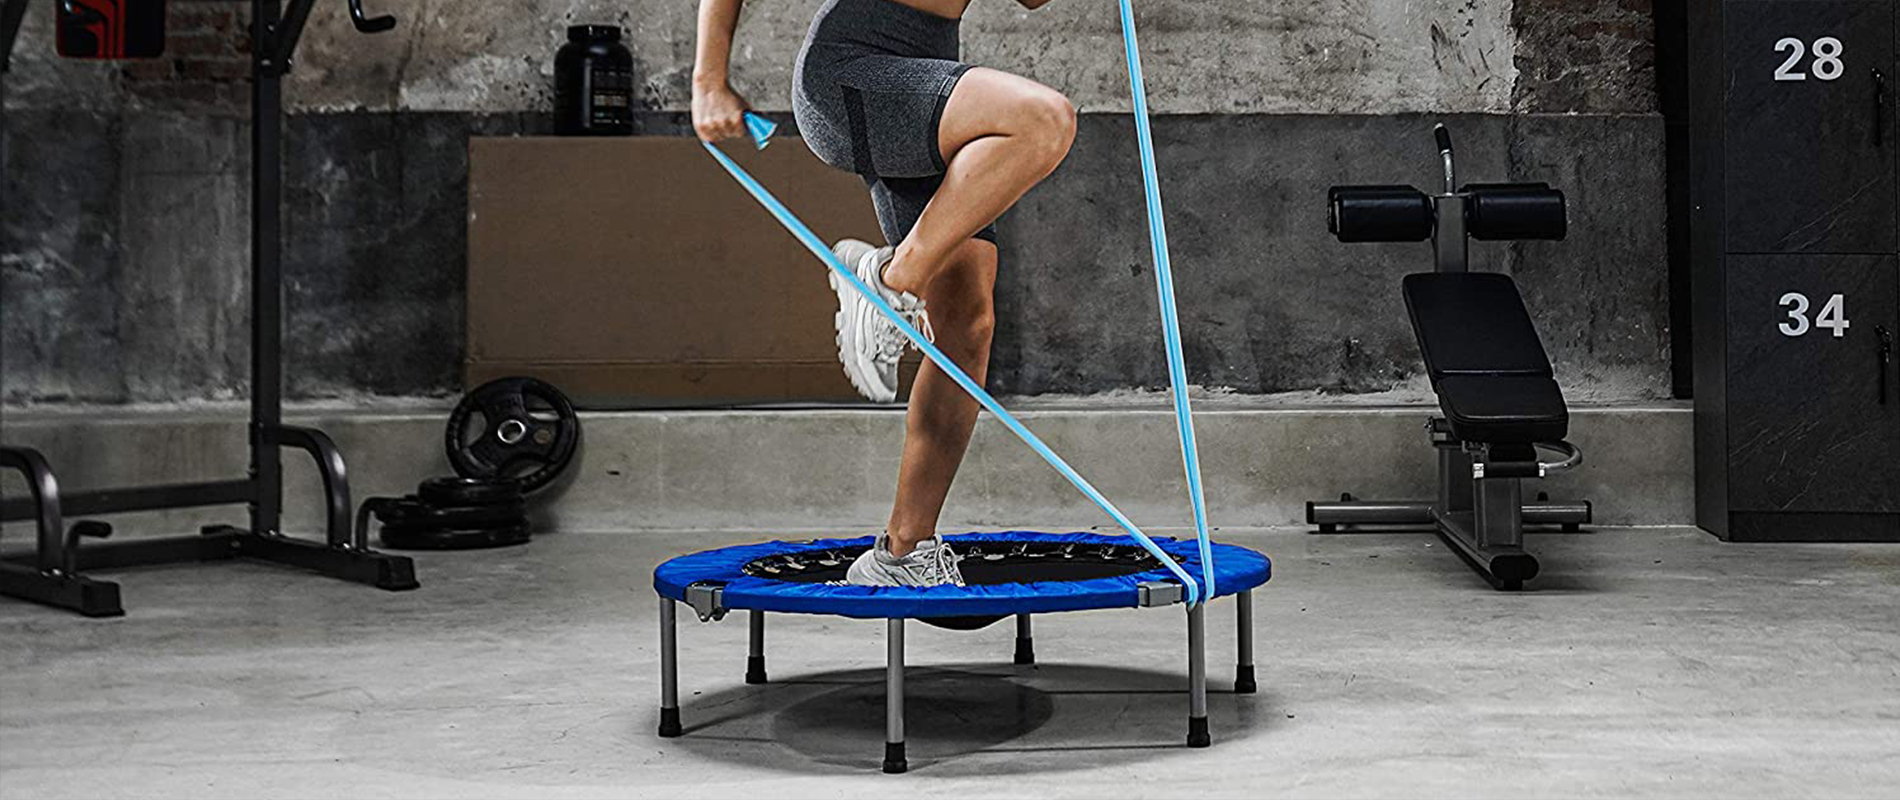 mini trampoline benefits